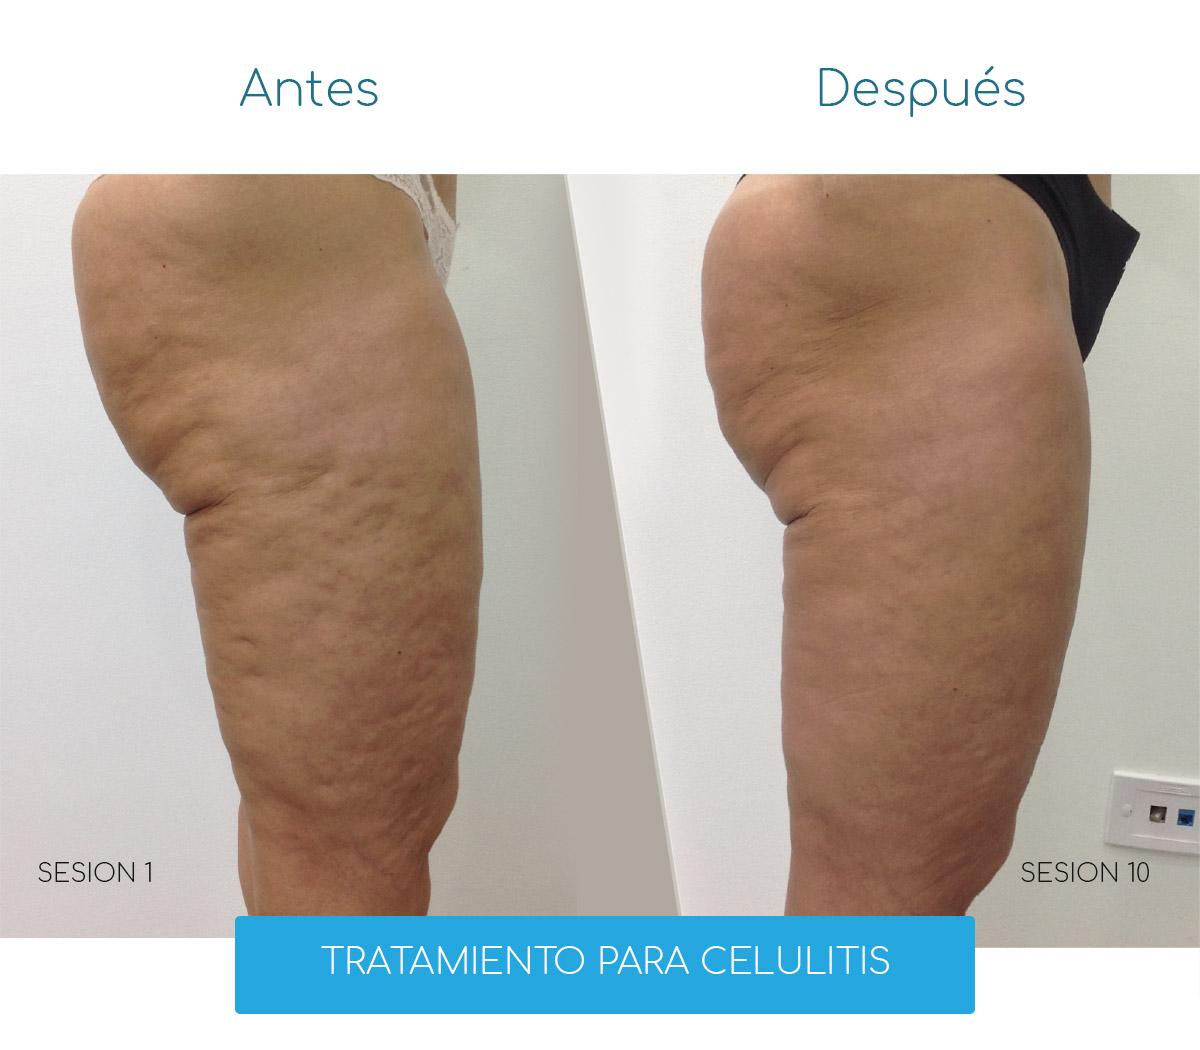 Tratamiento para Celulitis